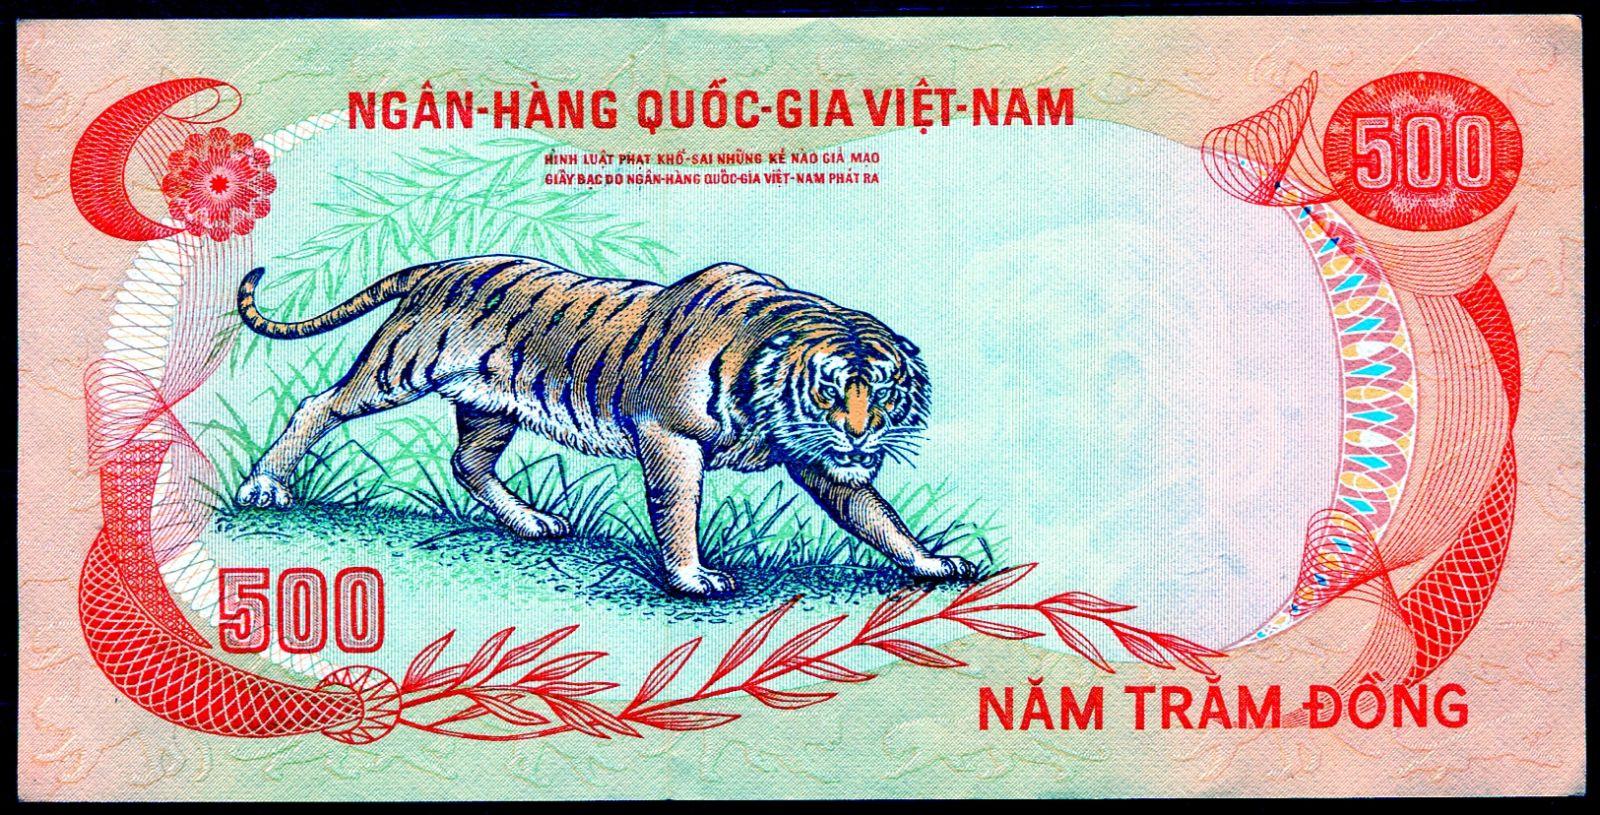 Jižní Vietnam (P 33) 500 Dong (1972) UNC